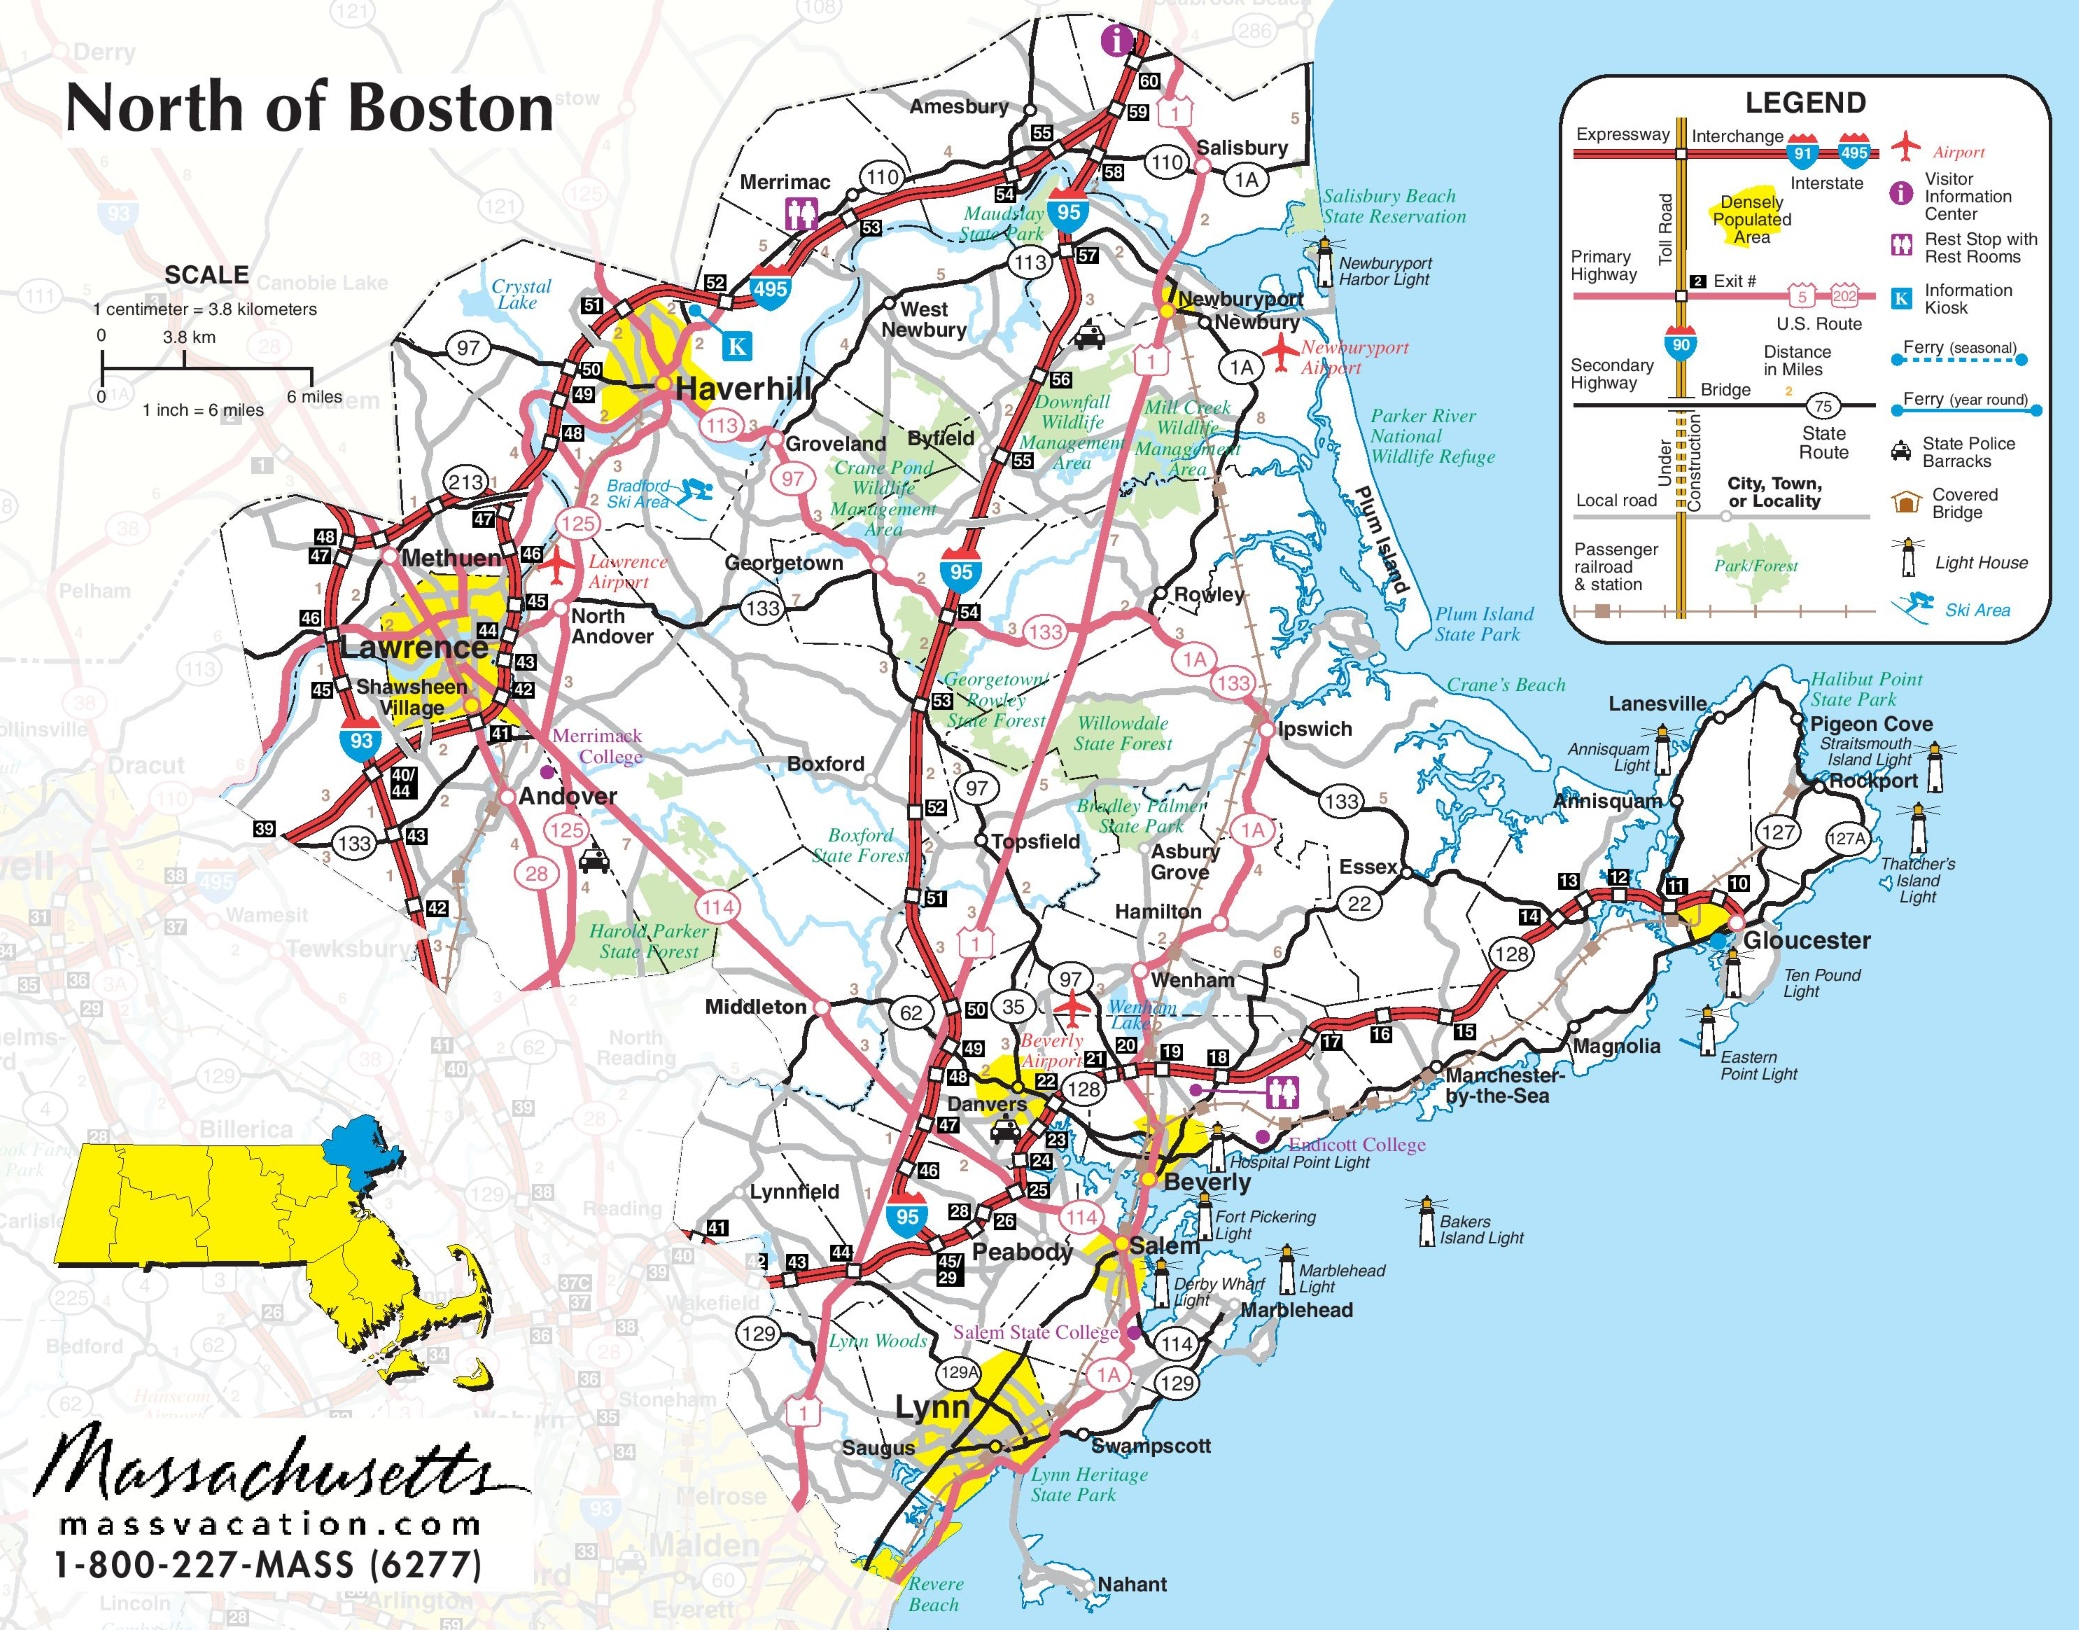 Boston Maps | Massachusetts, U.S. | Maps of Boston